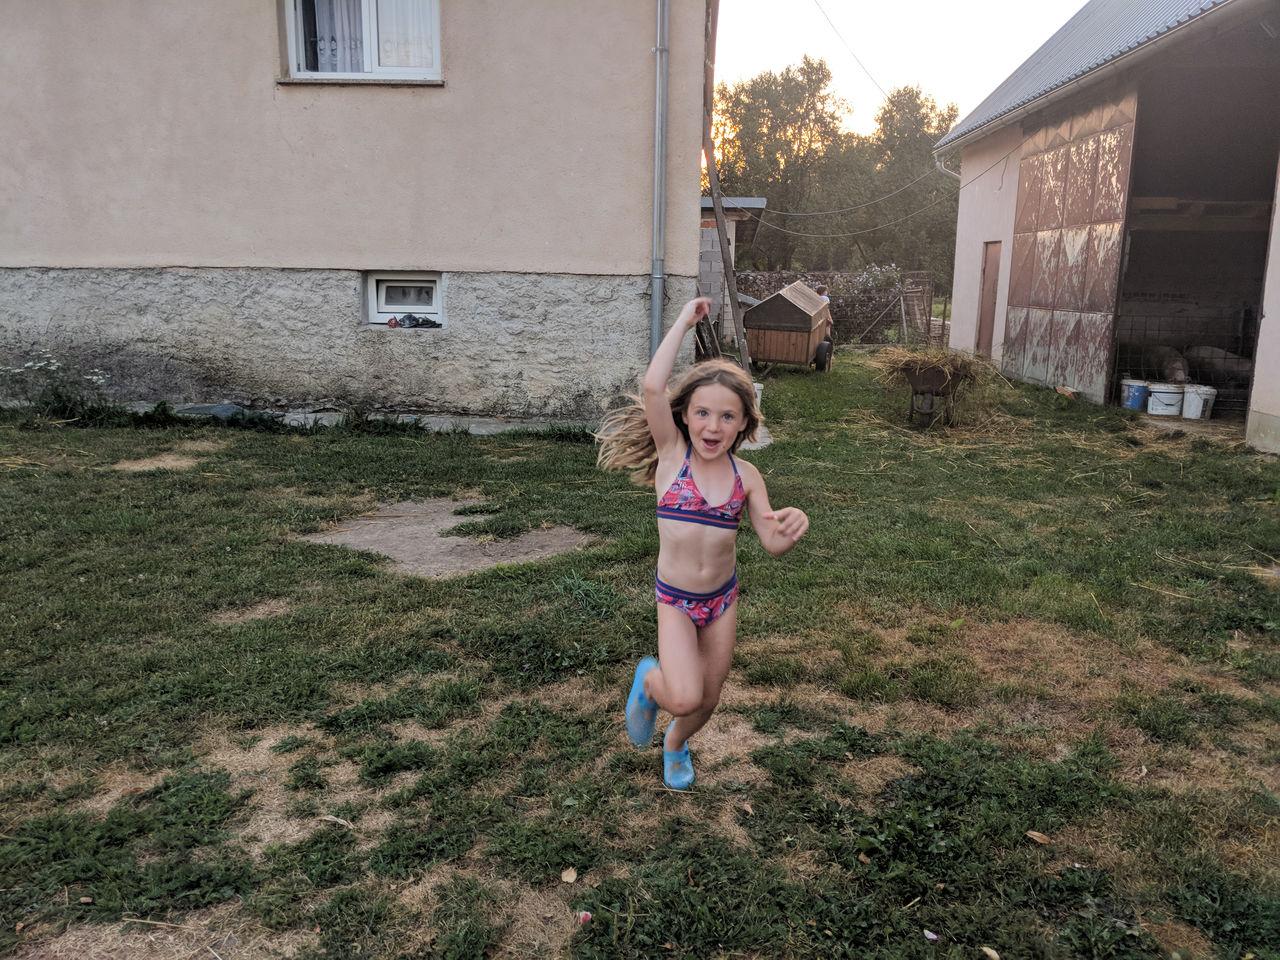 FULL LENGTH OF A GIRL STANDING AGAINST BUILDING